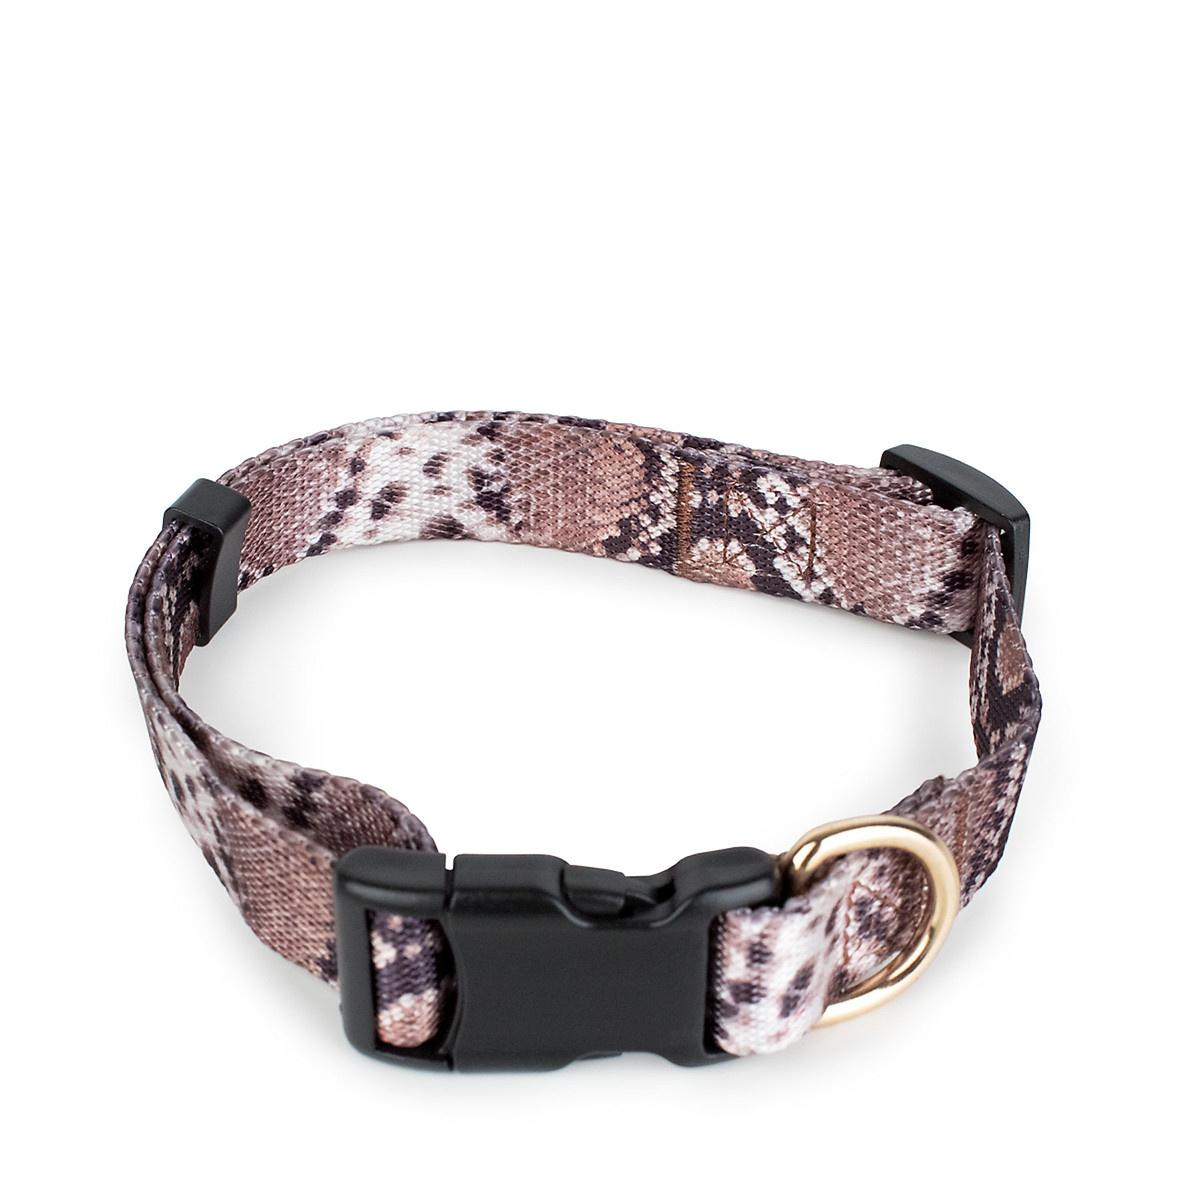 Boulevard Snake Dog Collar